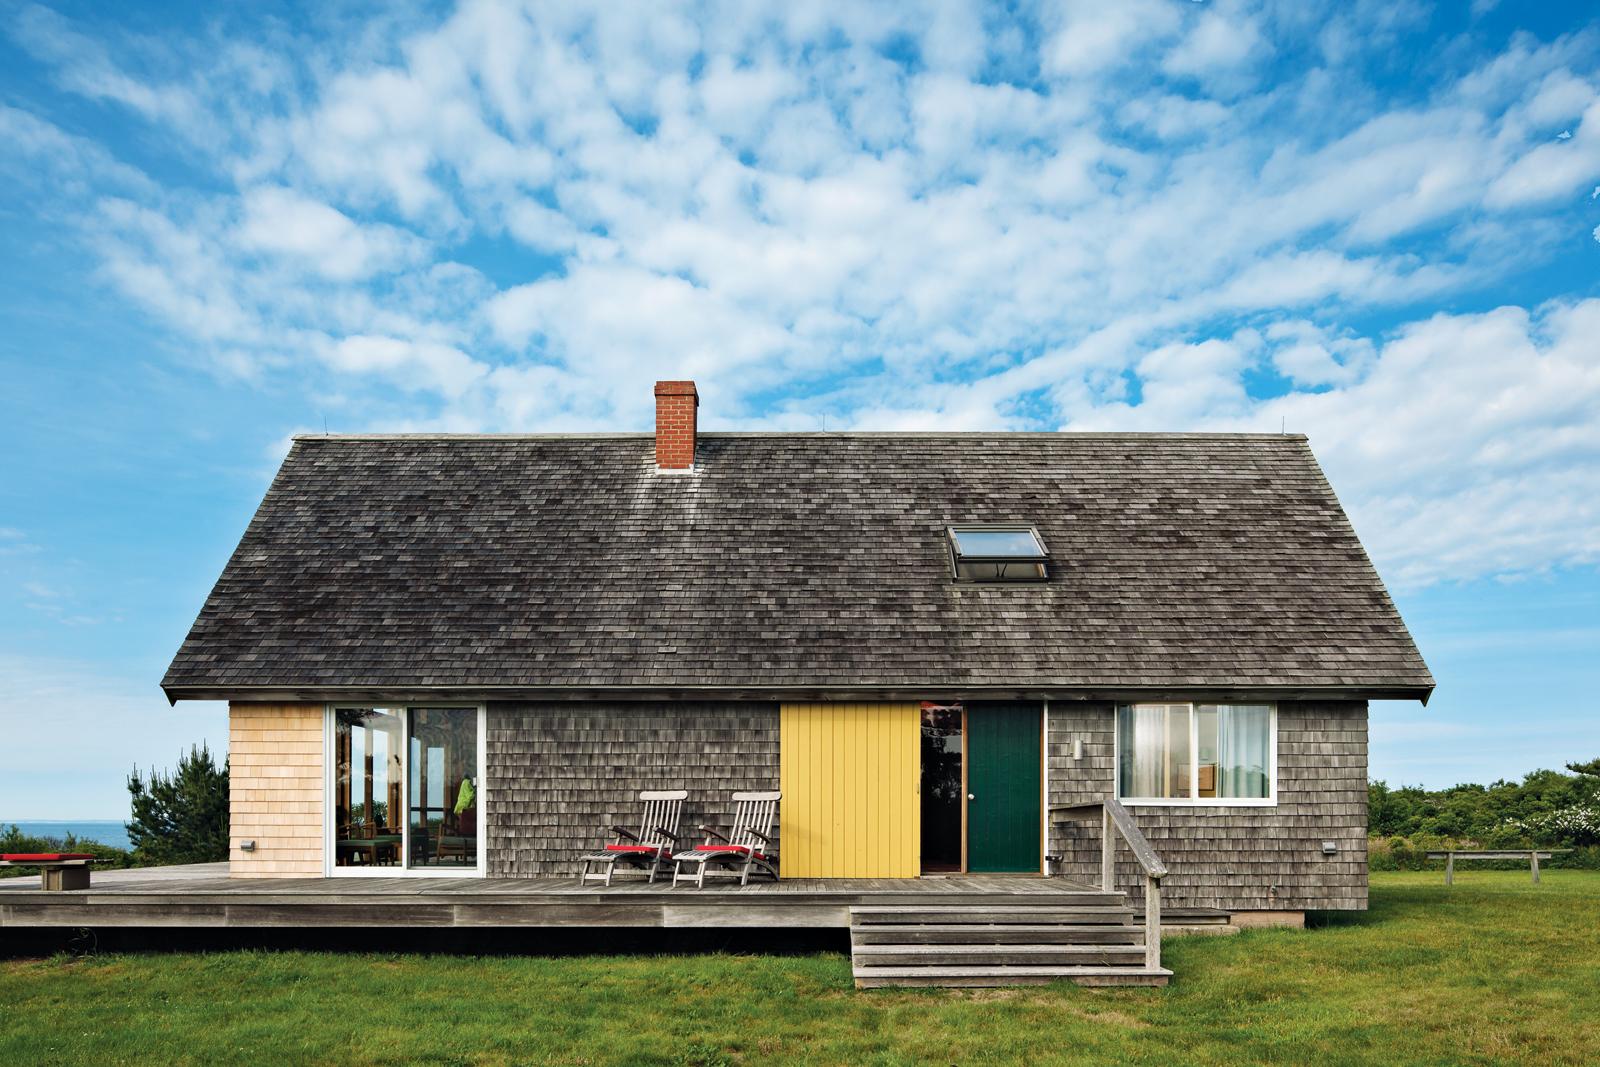 Designer Jens Risom's vacation home on Block Island